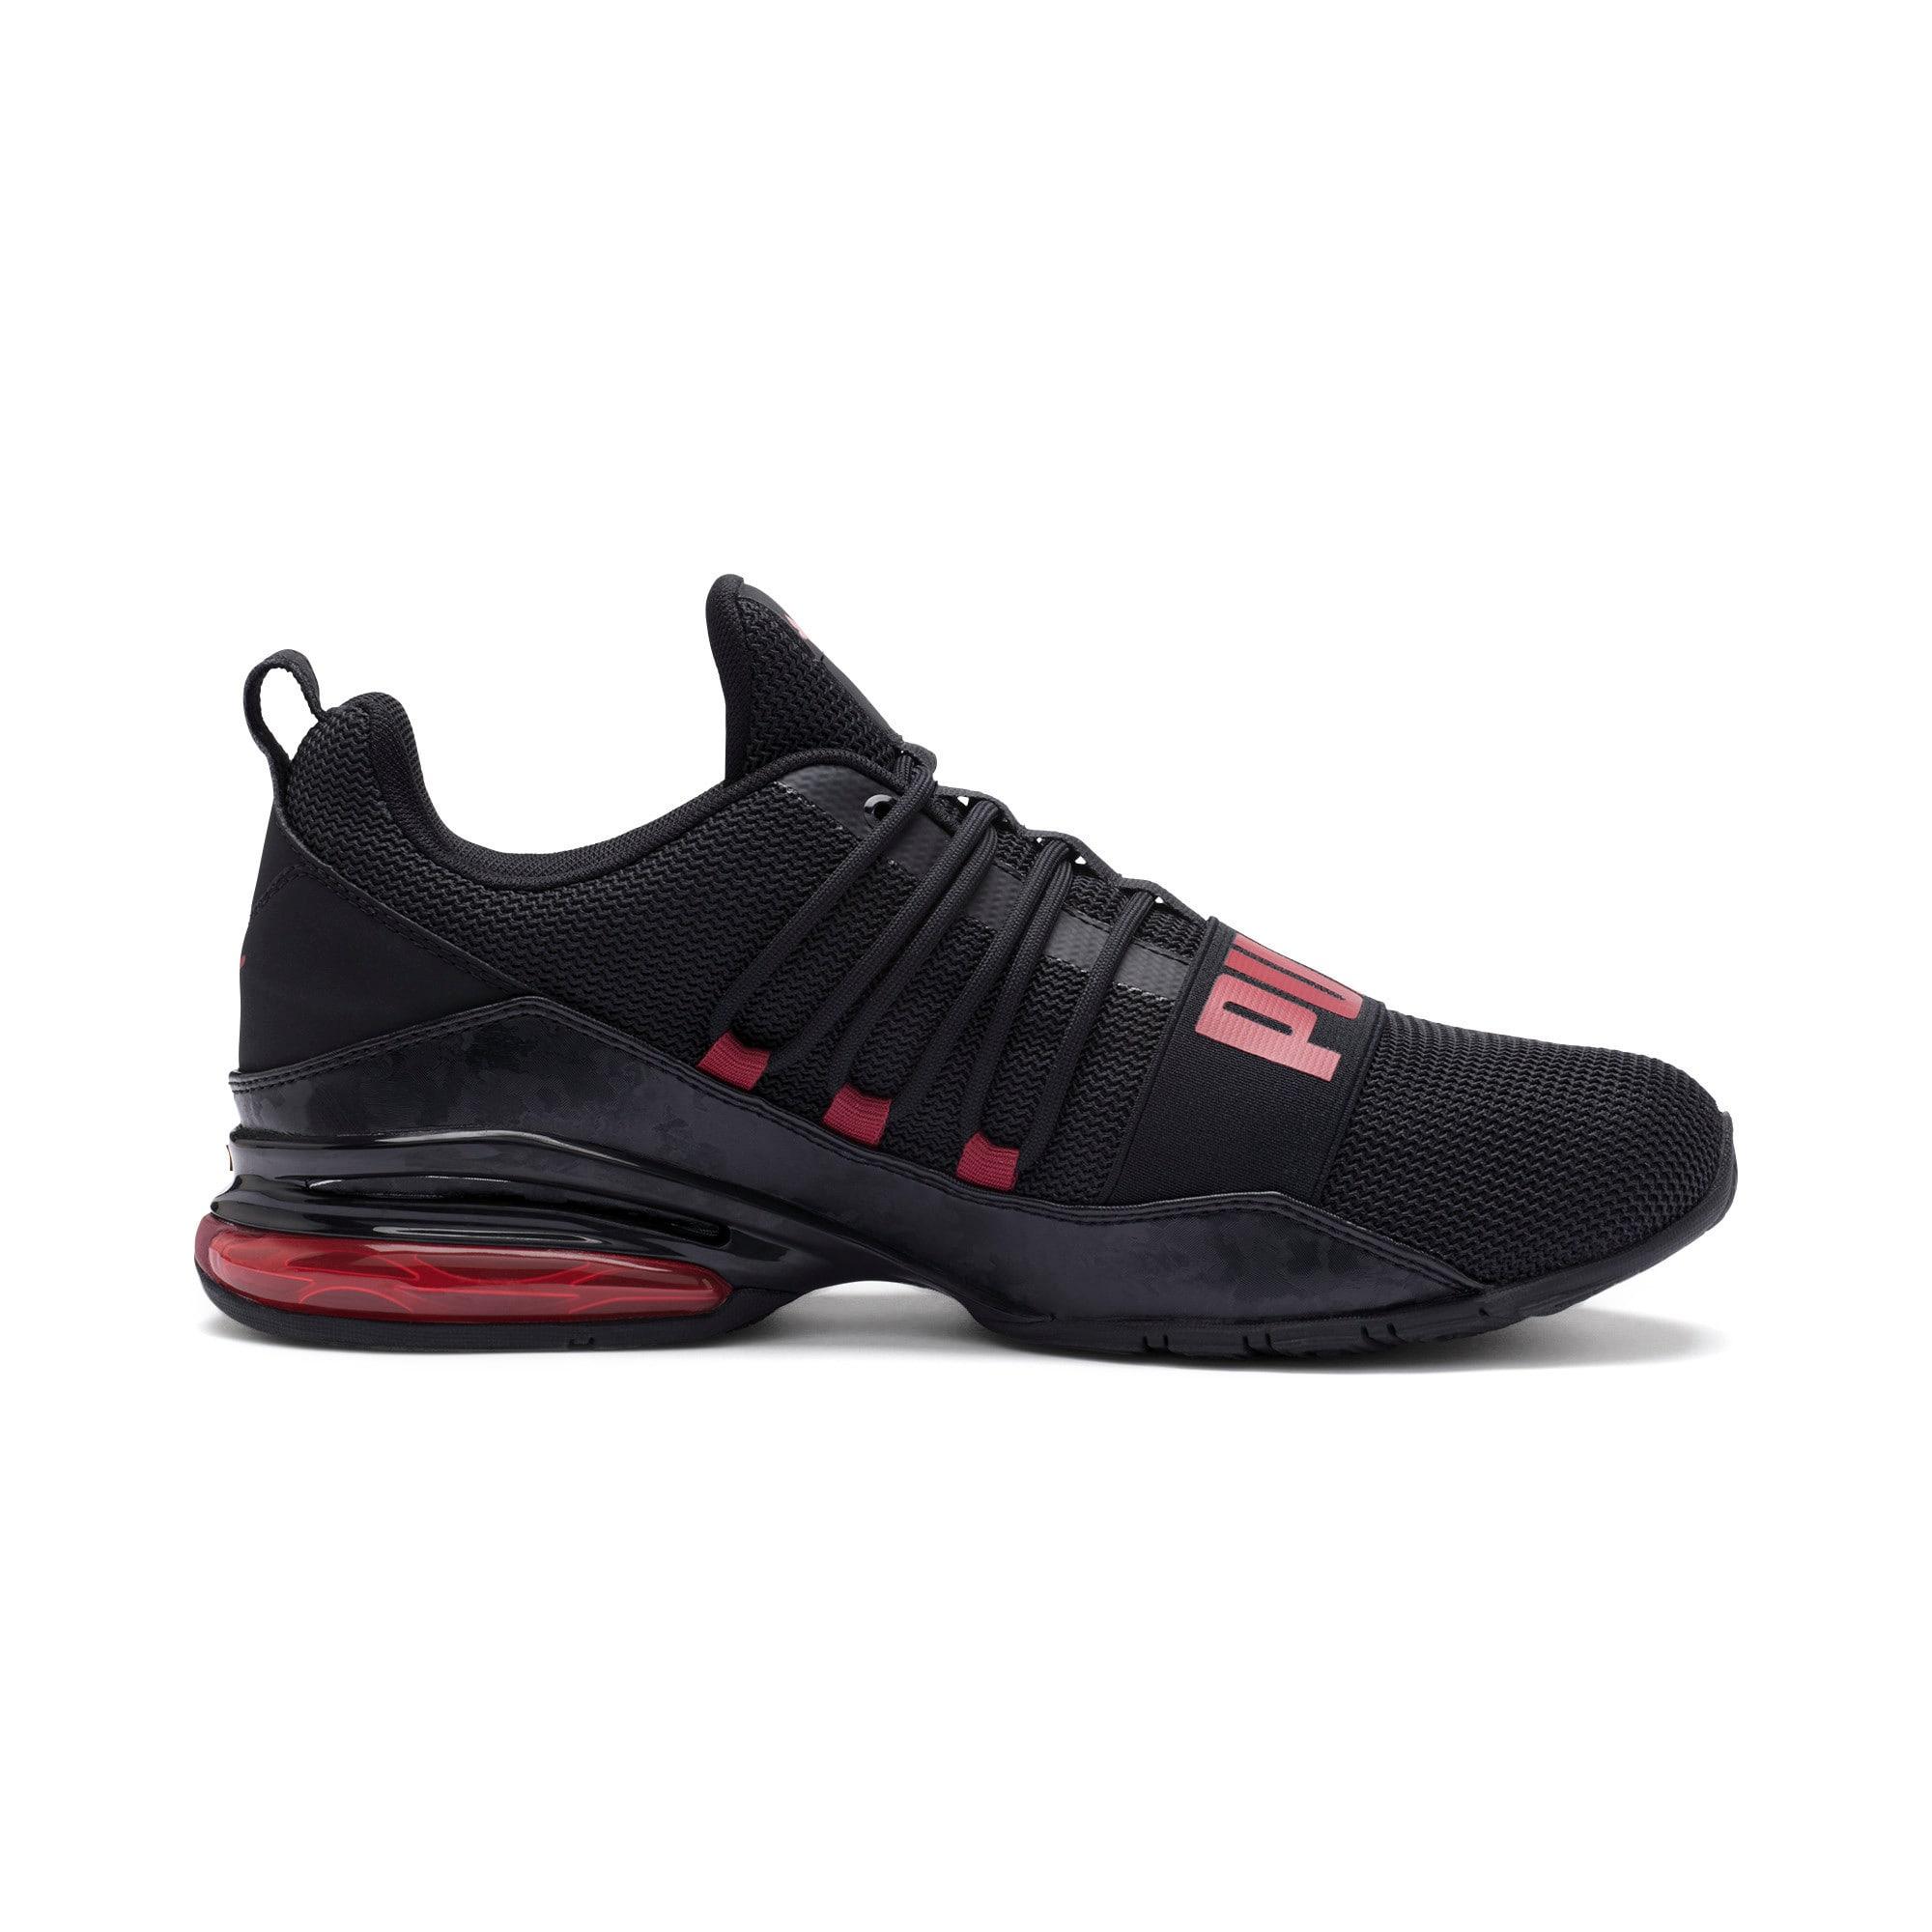 Miniatura 6 de Zapatos de entrenamiento CELL Regulate Camo para hombre, Puma Black-Rhubarb, mediano